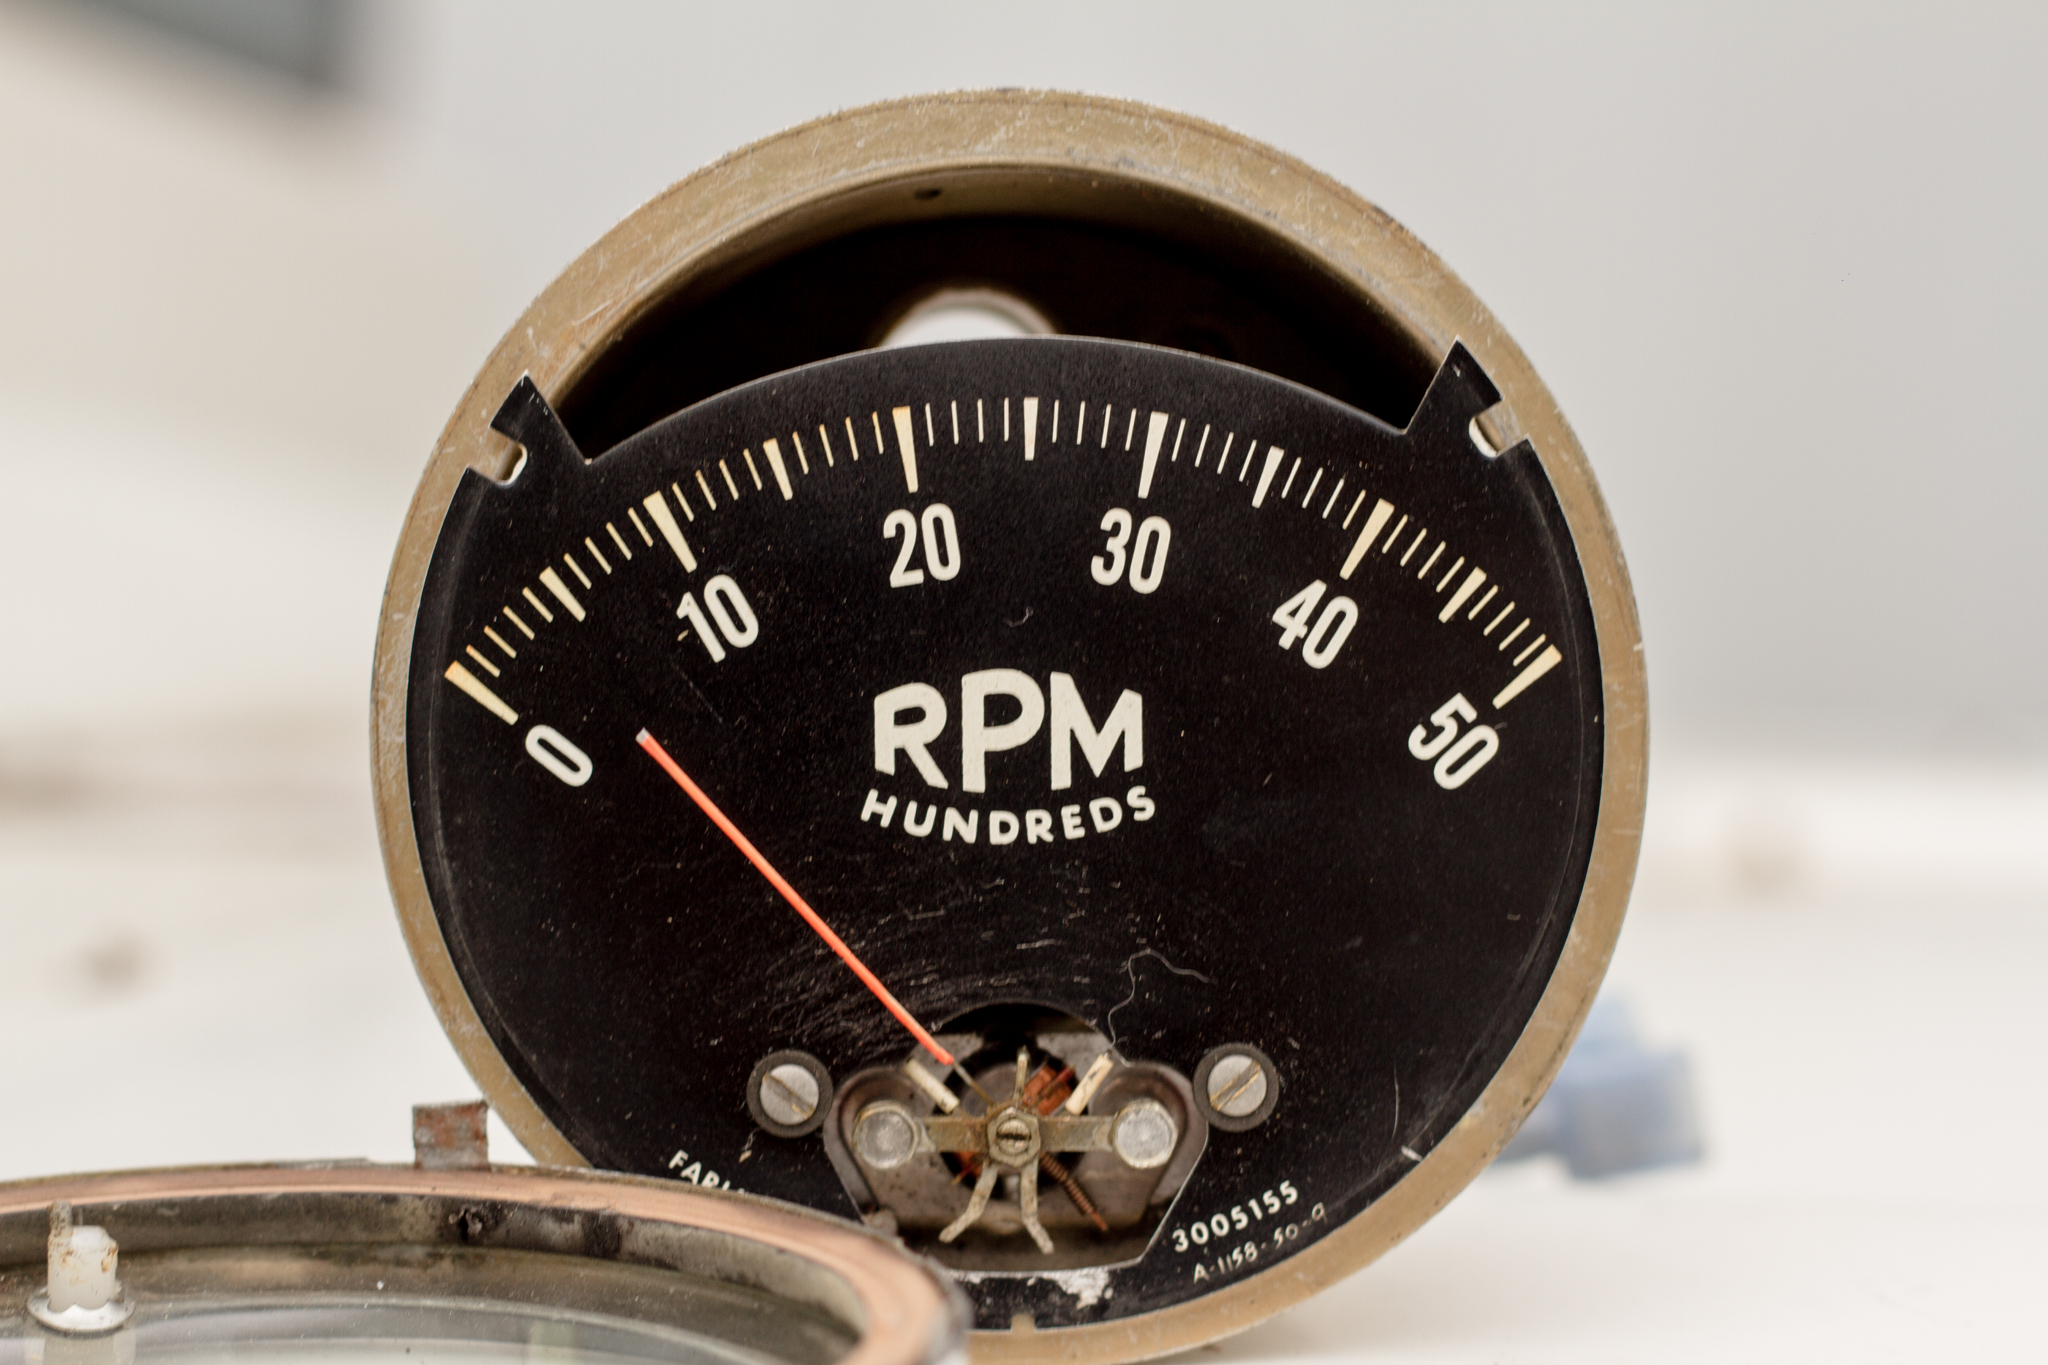 Faria Tachometer Wiring - wiring diagrams